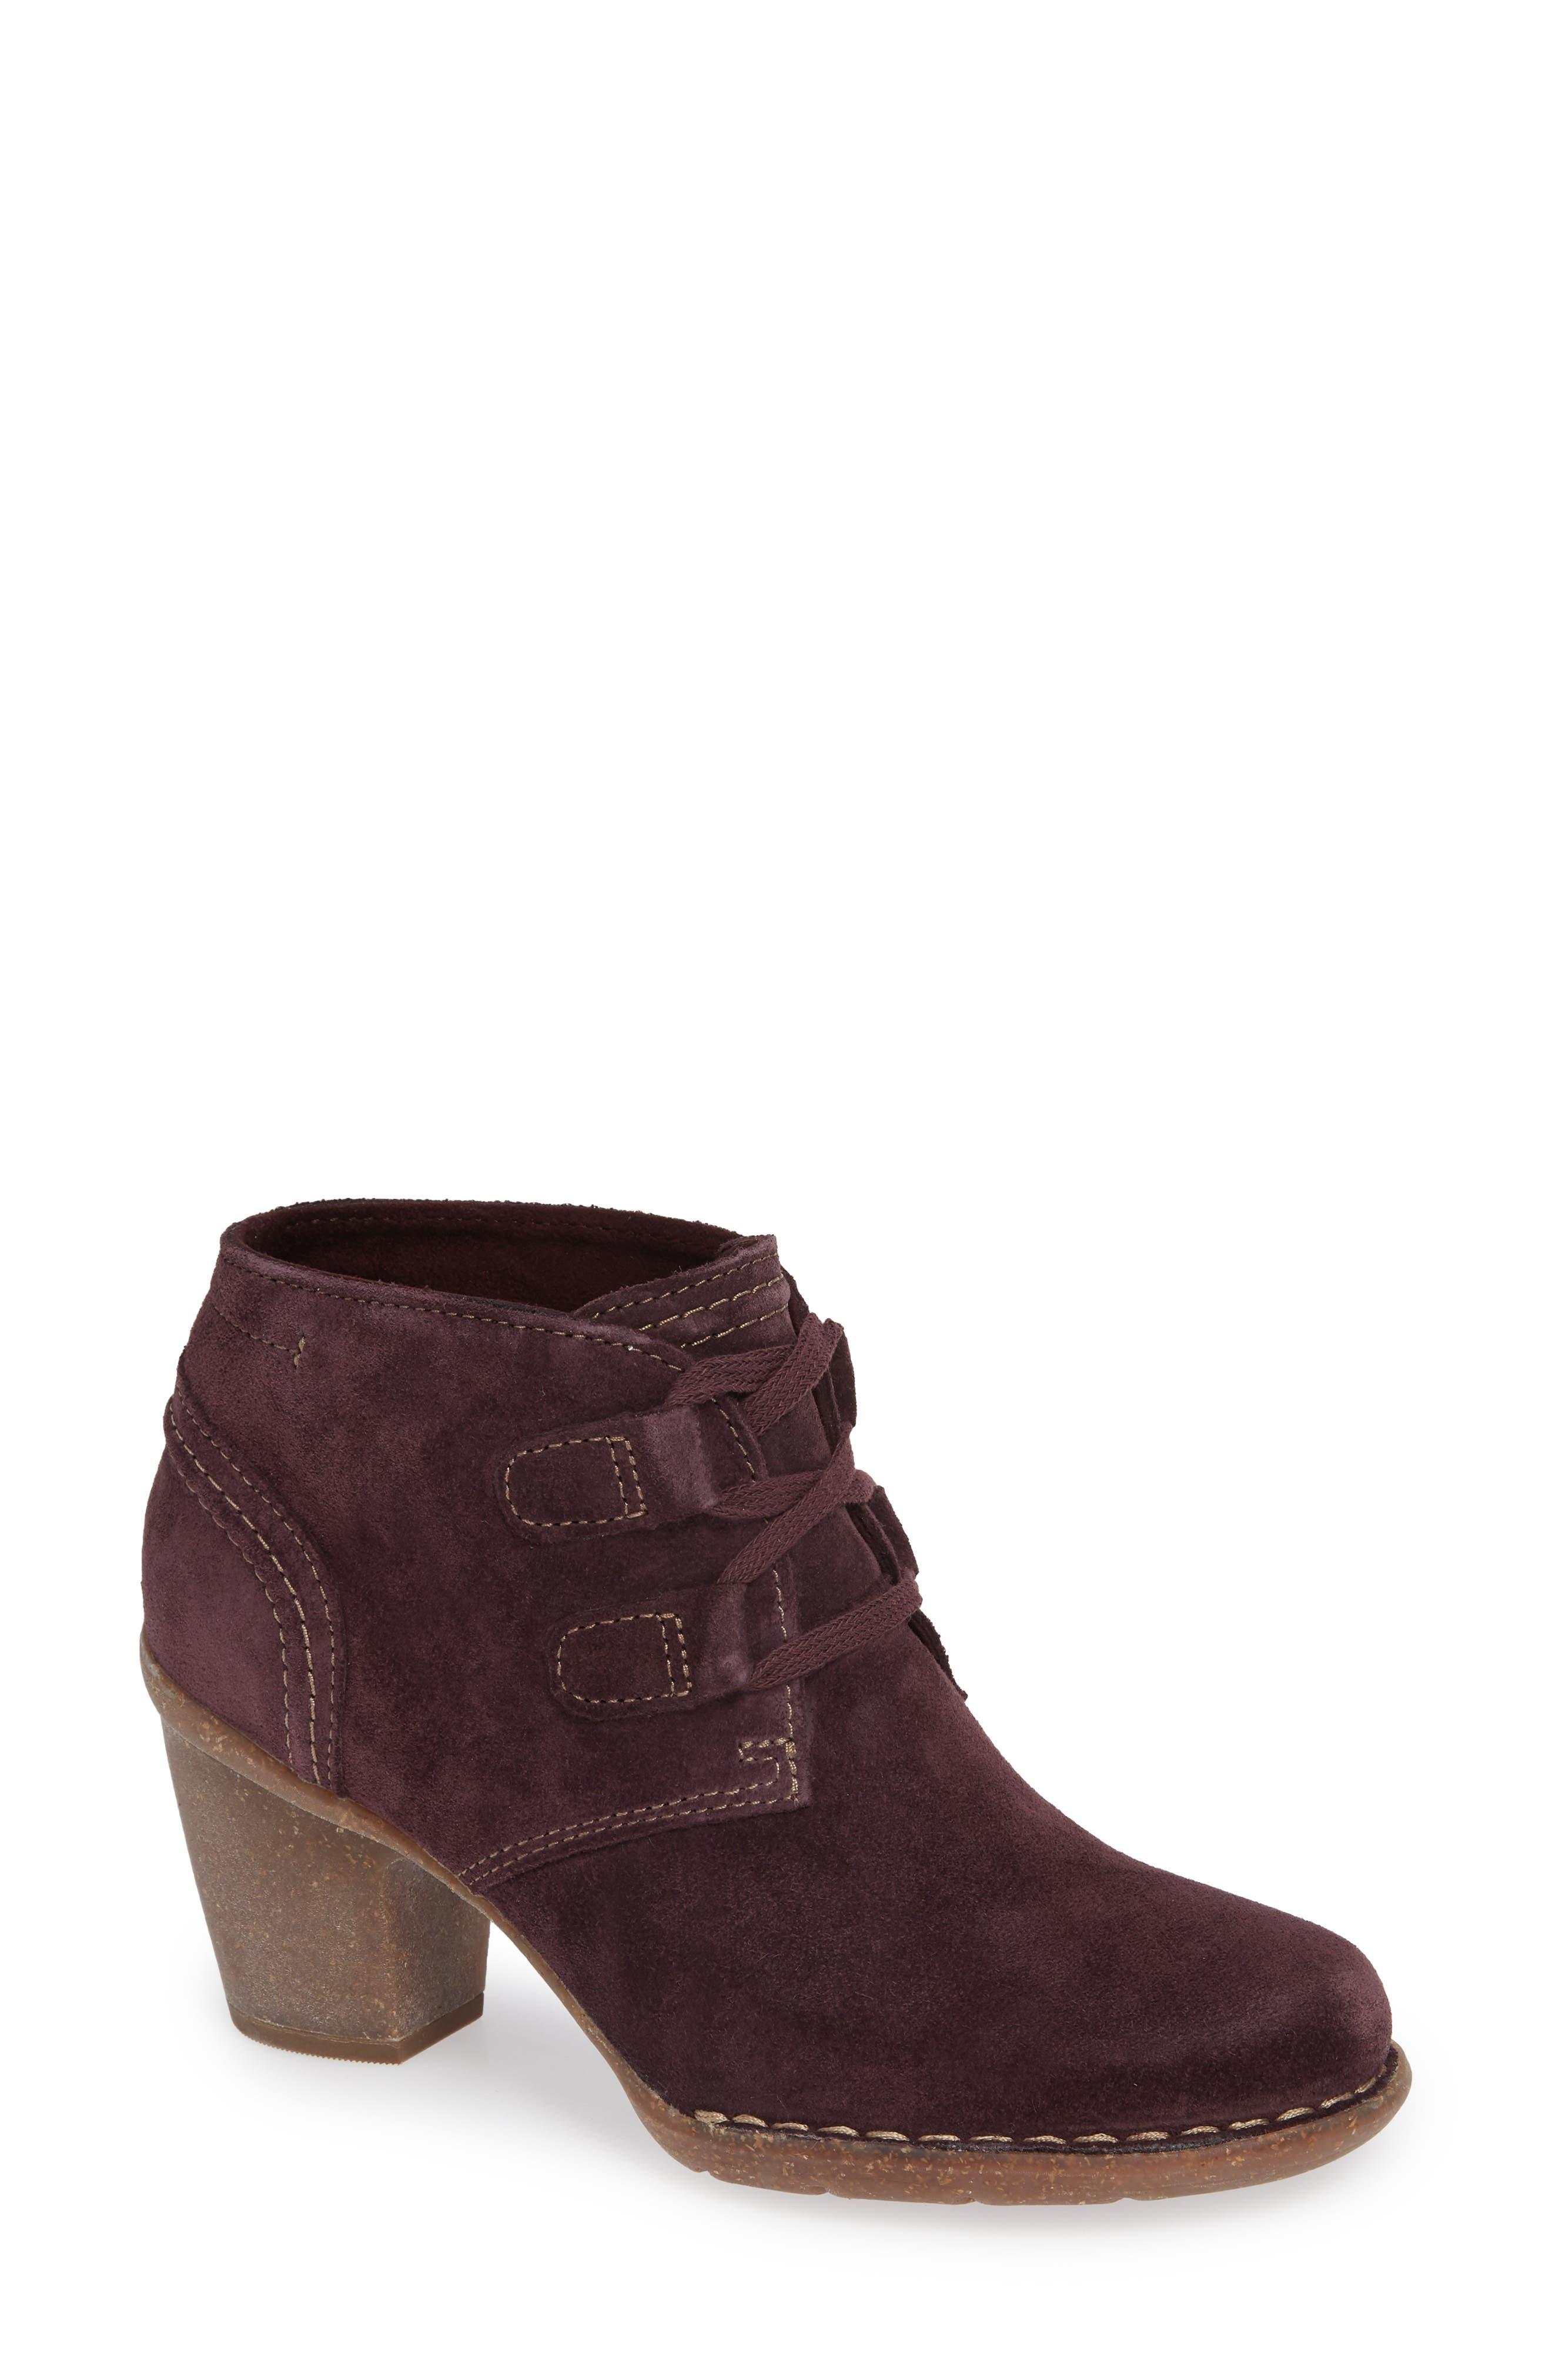 Clarks Carleta Lyon Ankle Boot- Burgundy